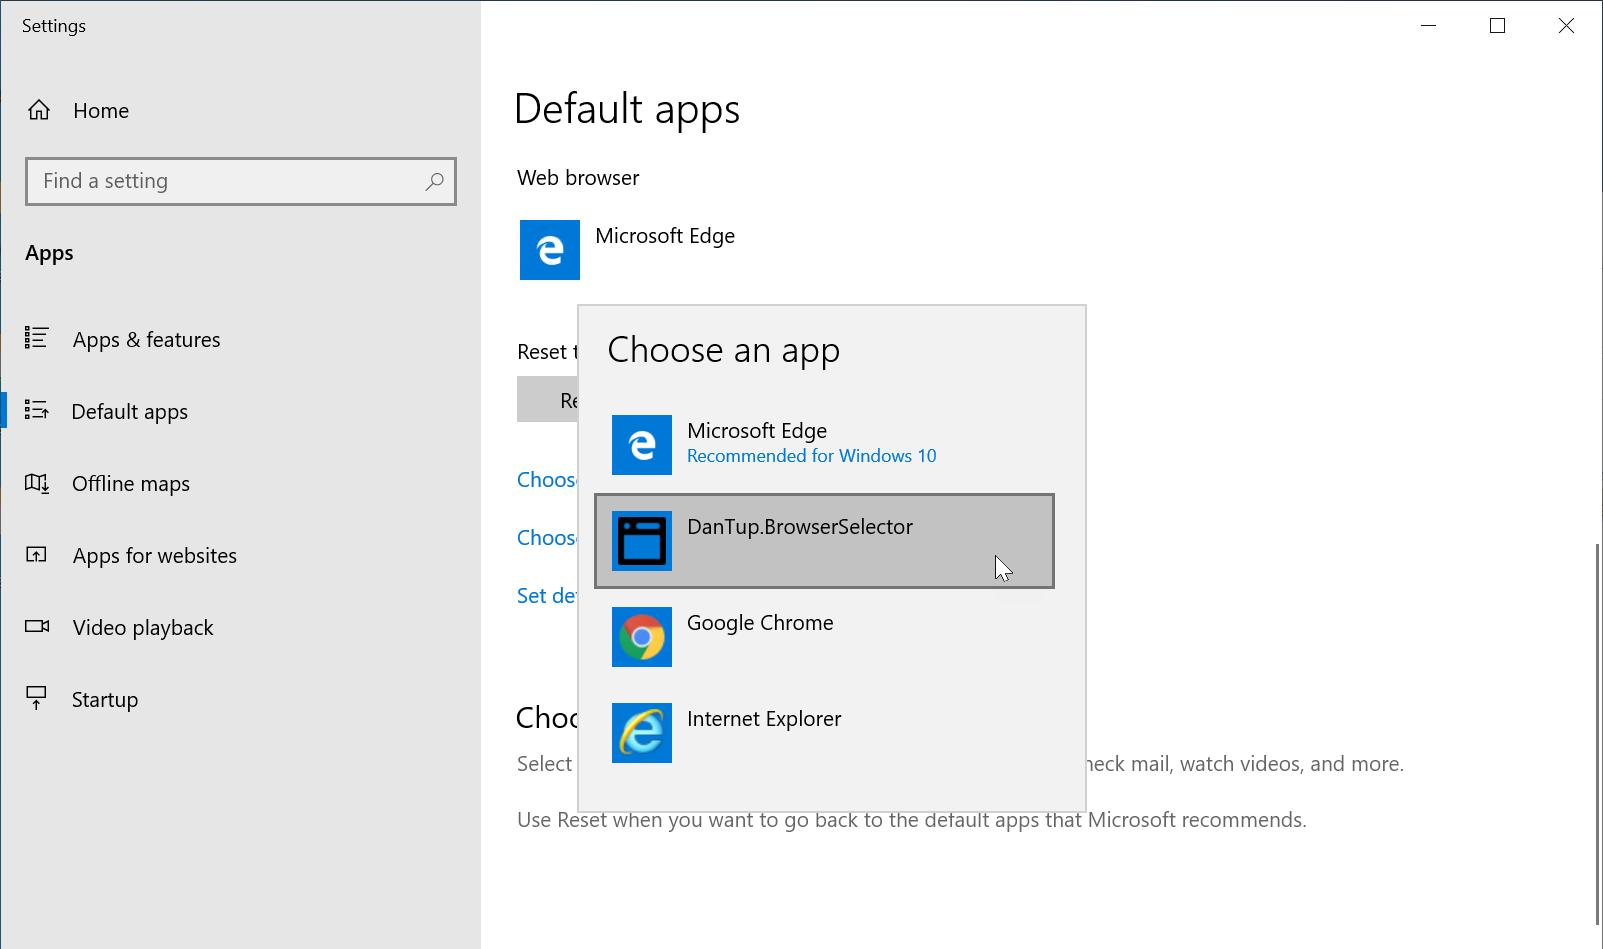 將預設瀏覽器調整為 DanTup.BrowserSelector